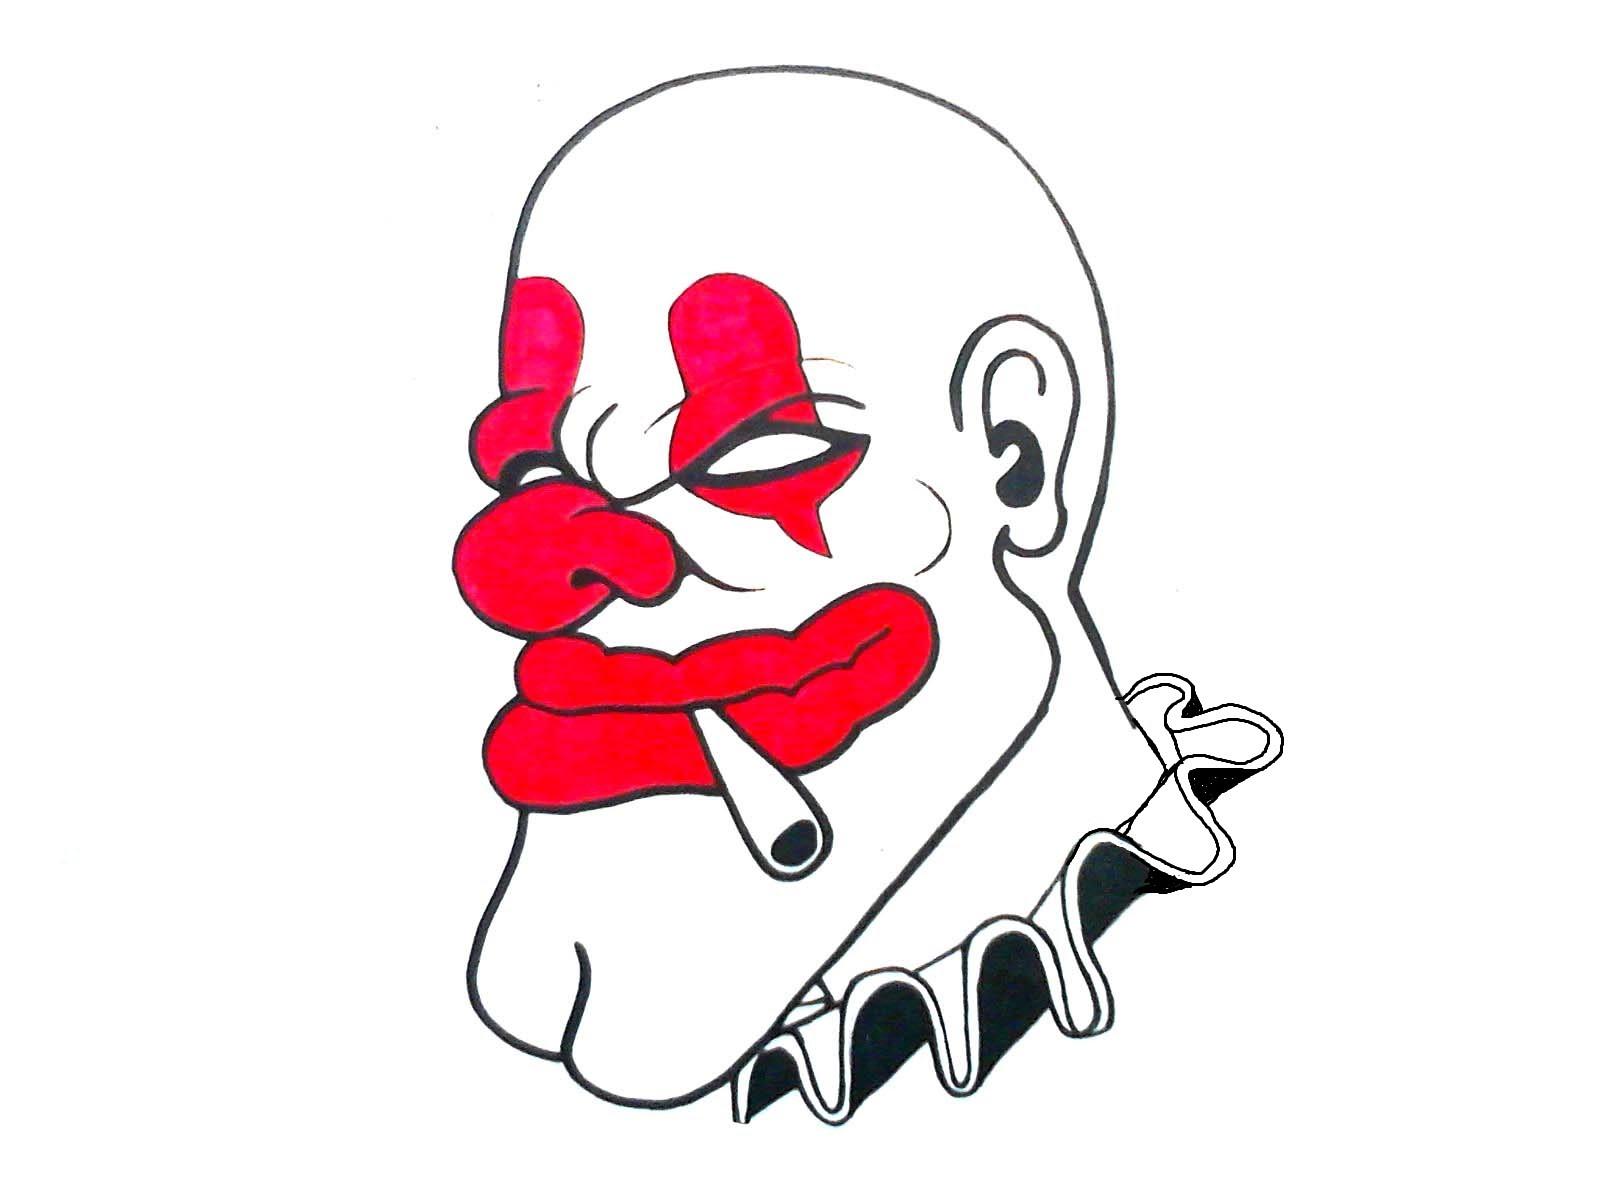 1600x1200 How To Draw A Gangsta How To Draw A Gangsta Clown